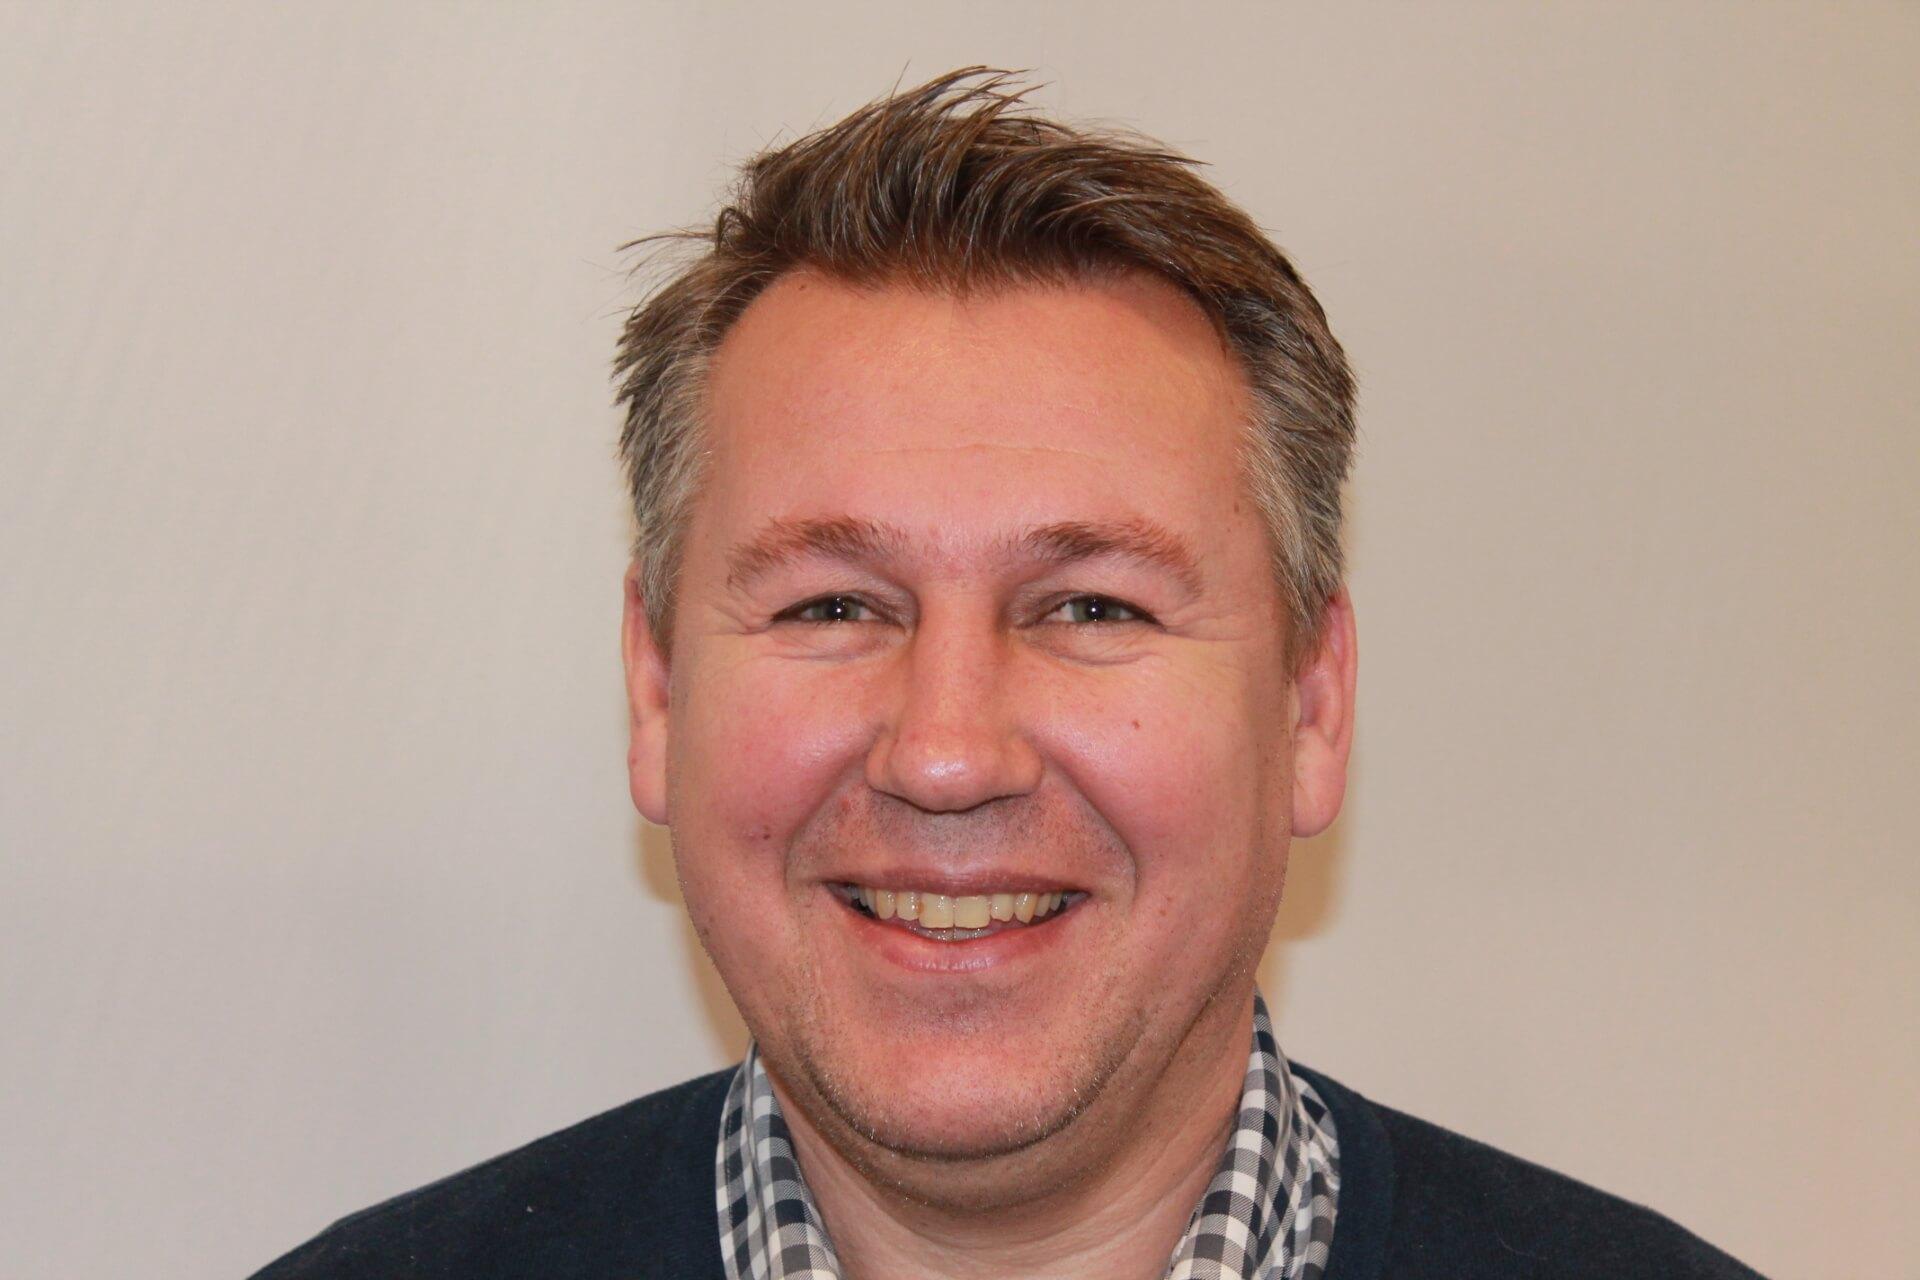 Ole Bjørn Johannessen